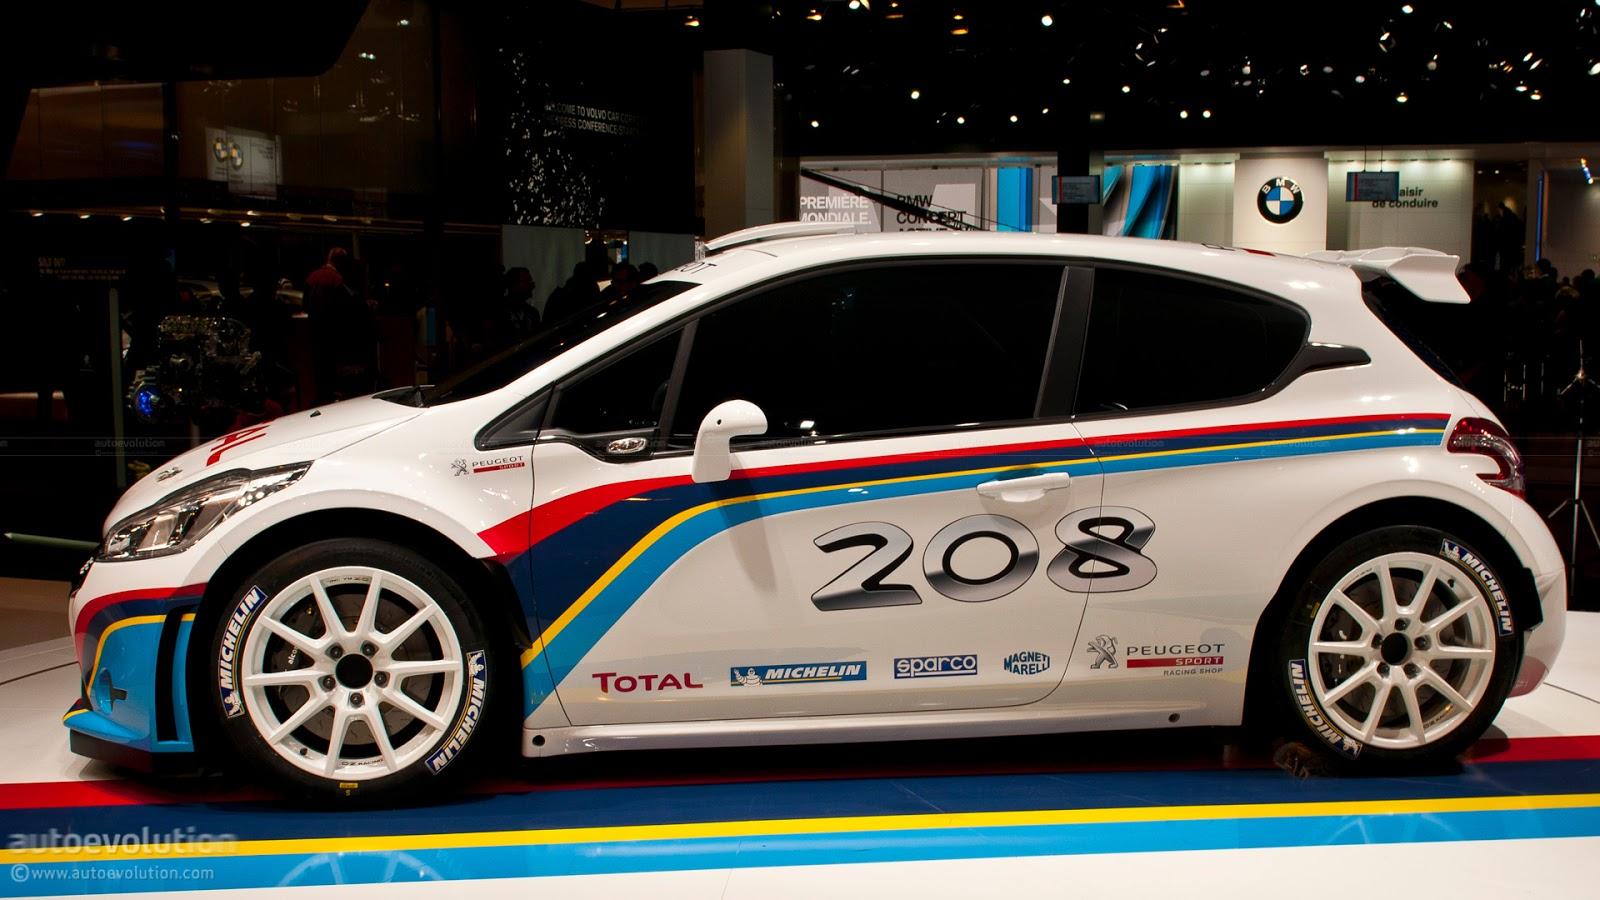 Nancys Car Designs: 2013 Peugeot 208 R5 Rally Car